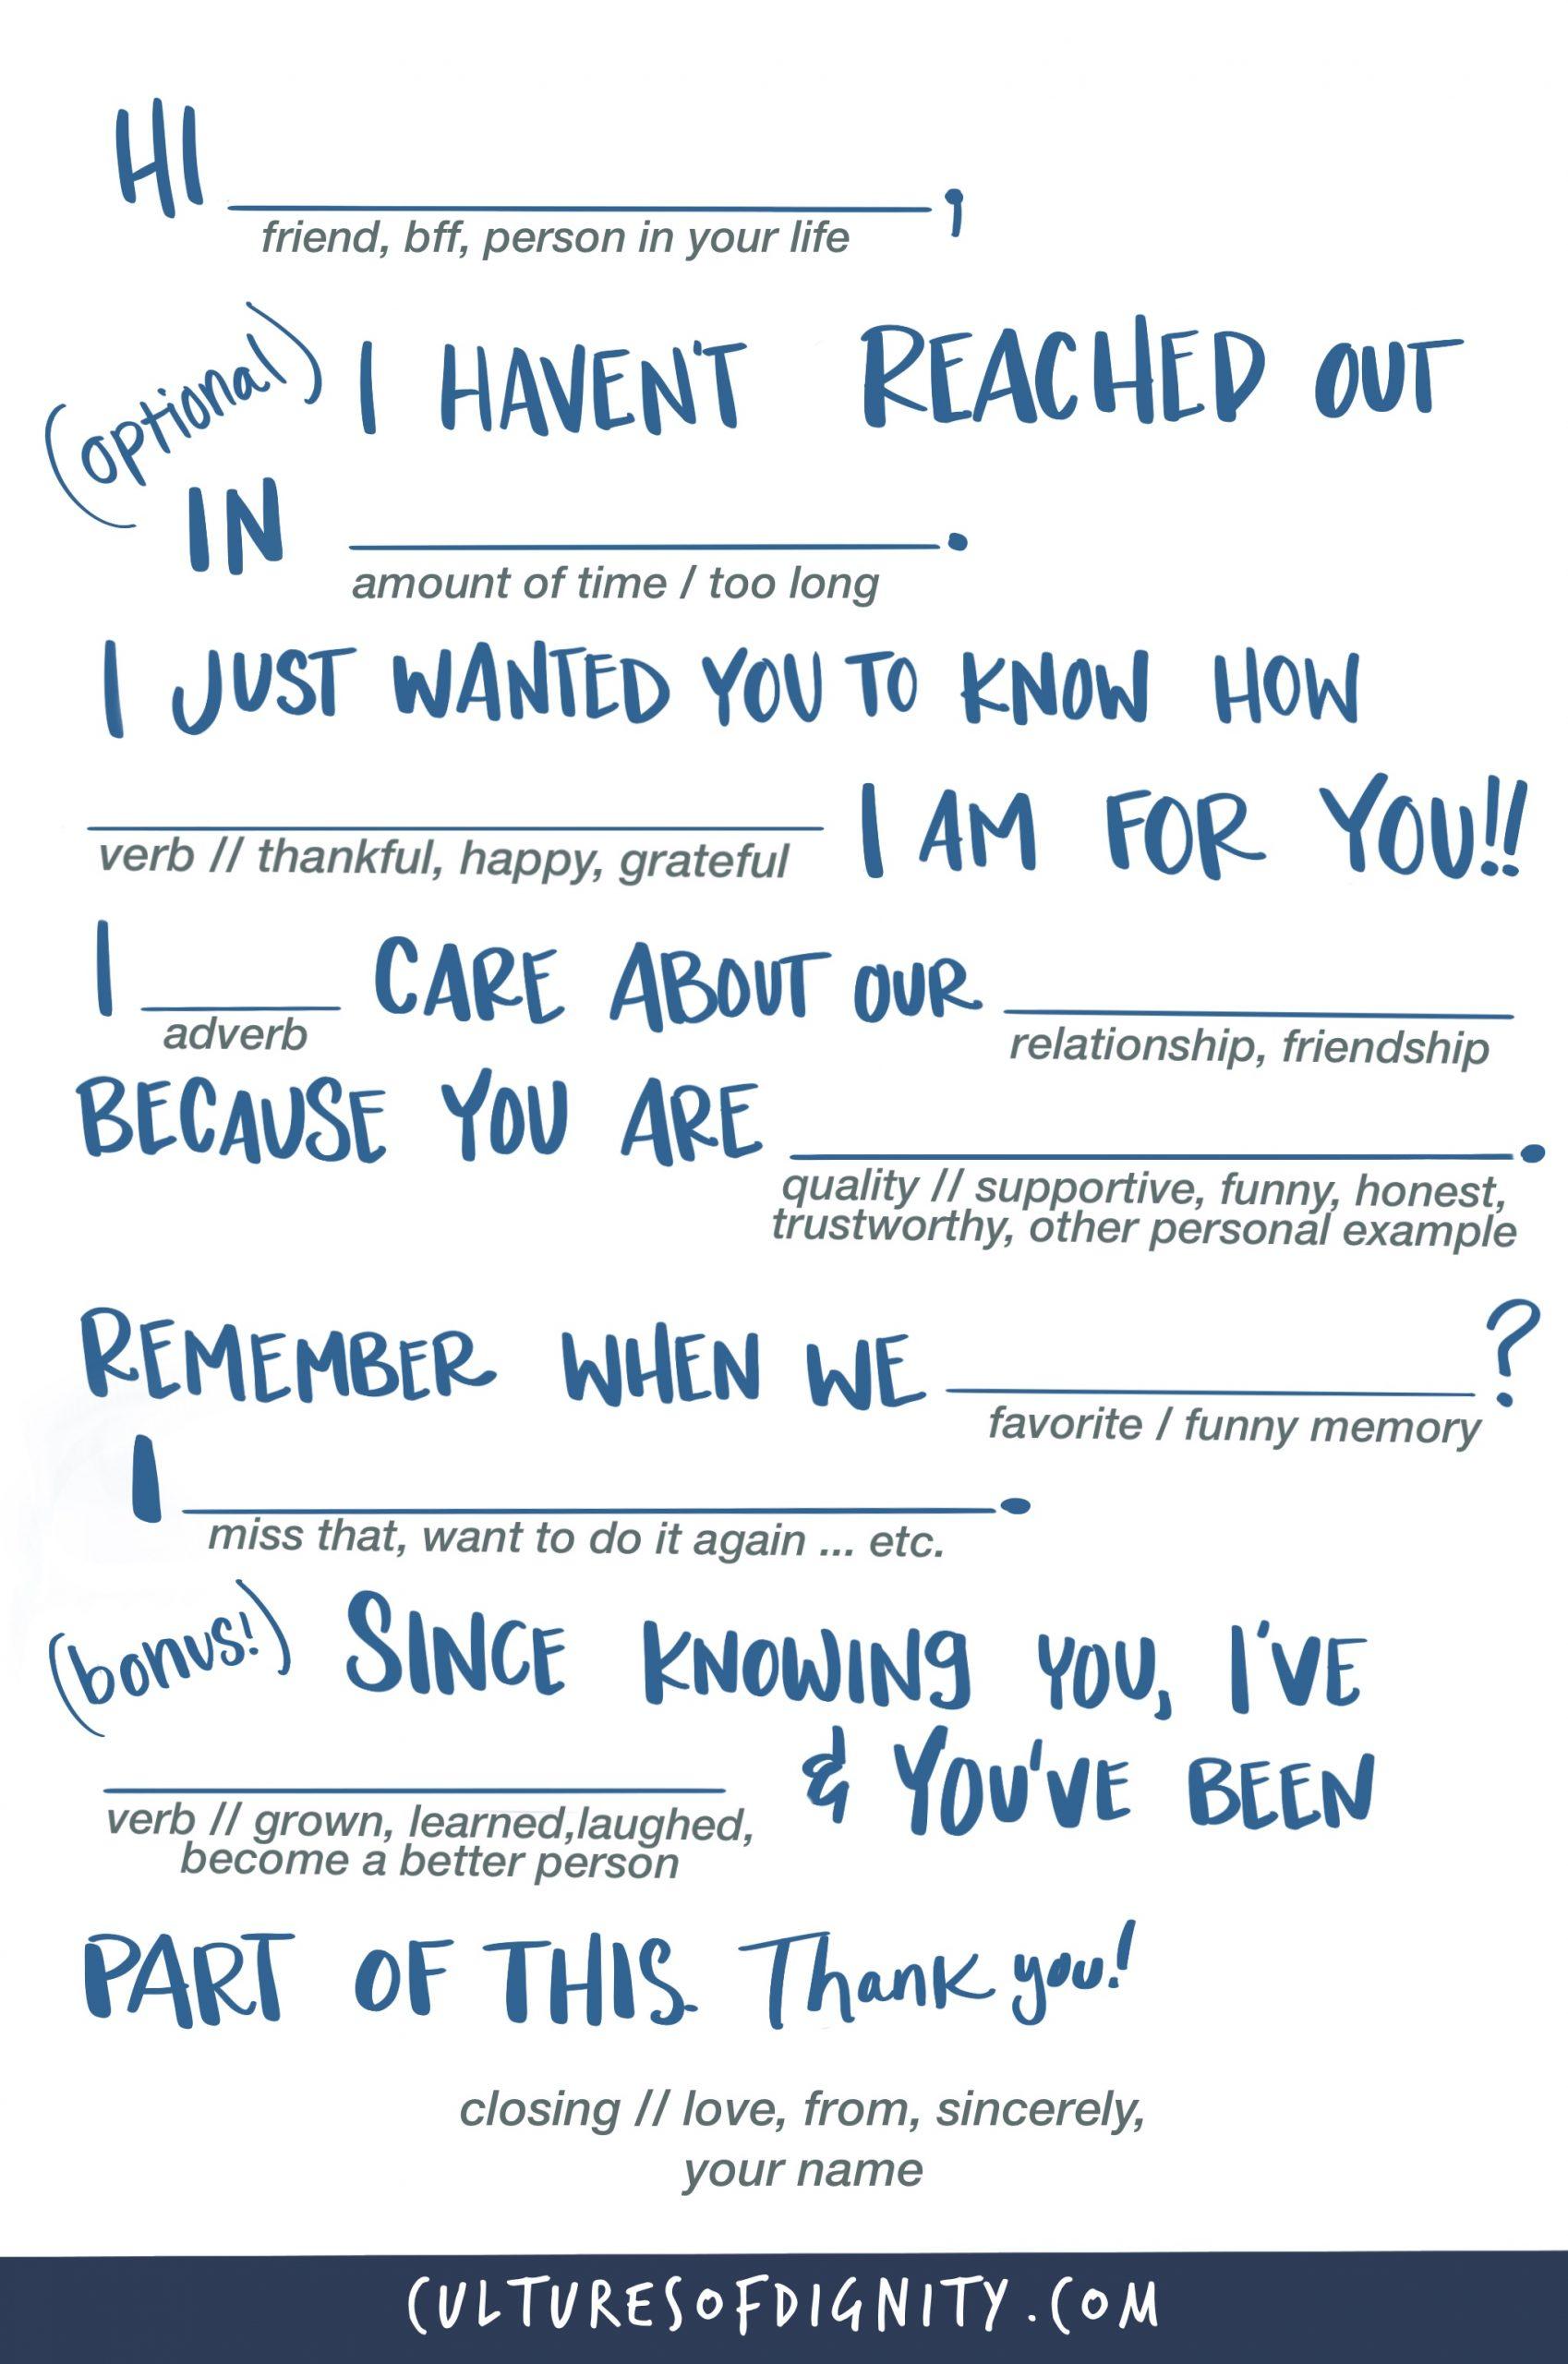 Send a Card to a Friend Day!